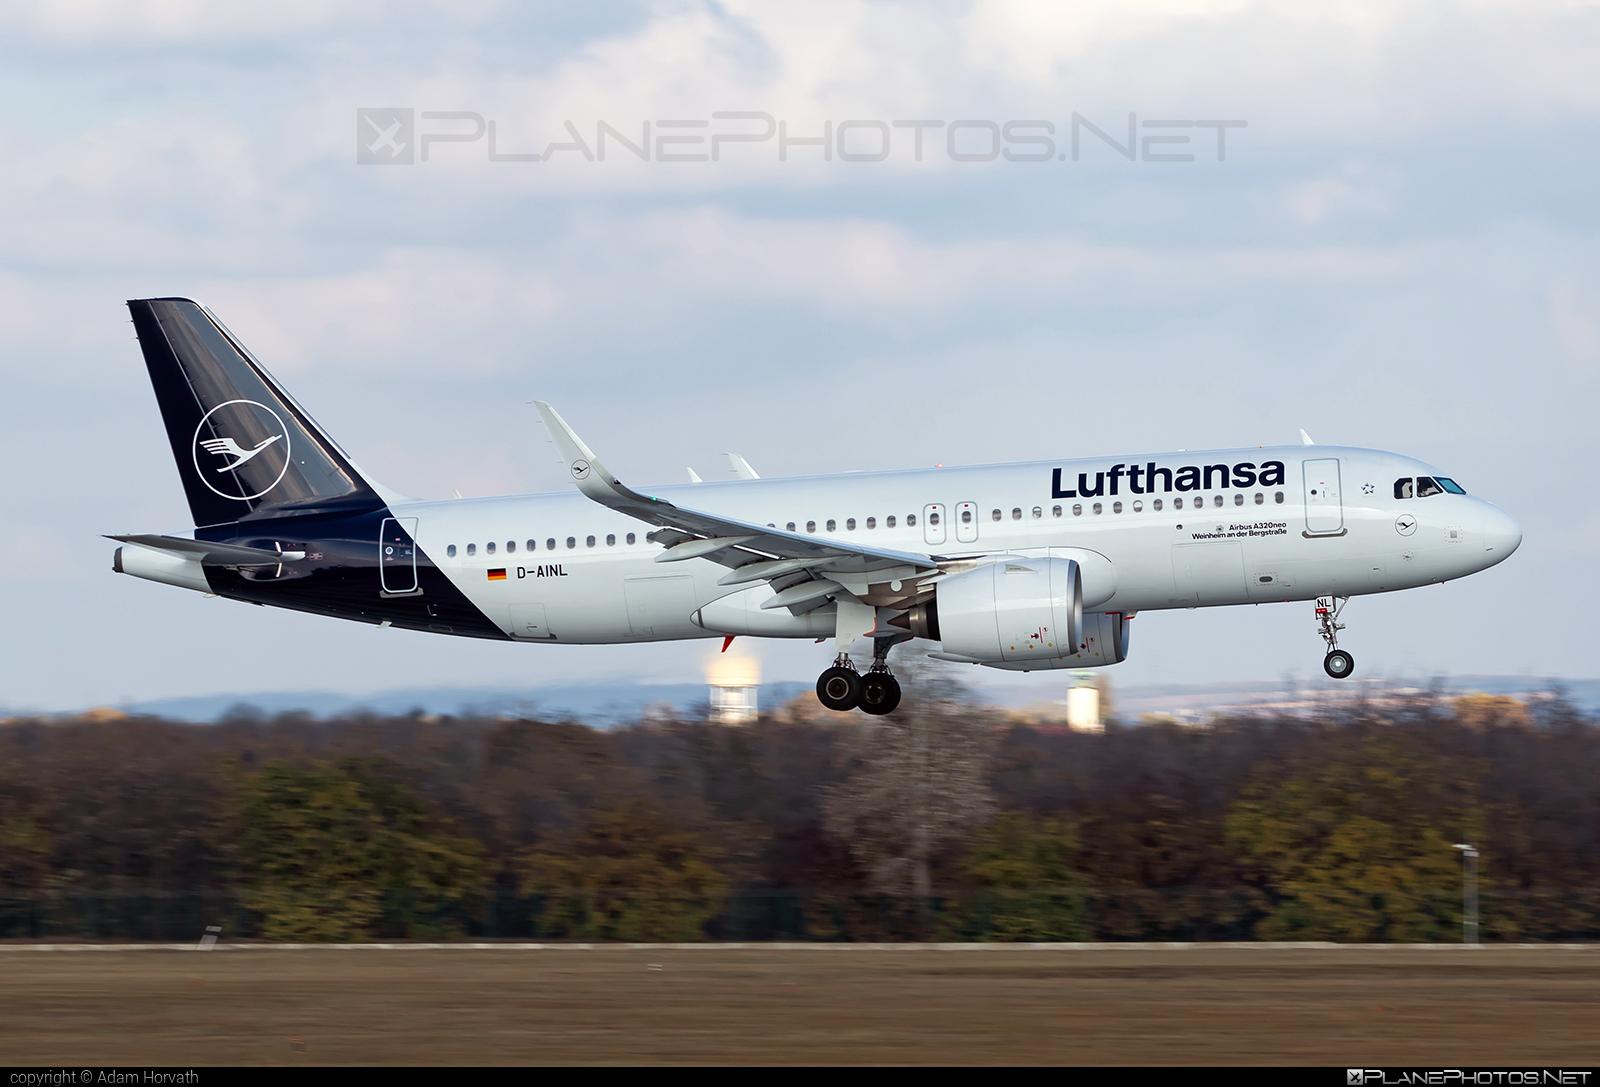 Airbus A320-271N - D-AINL operated by Lufthansa #a320 #a320family #a320neo #airbus #airbus320 #lufthansa